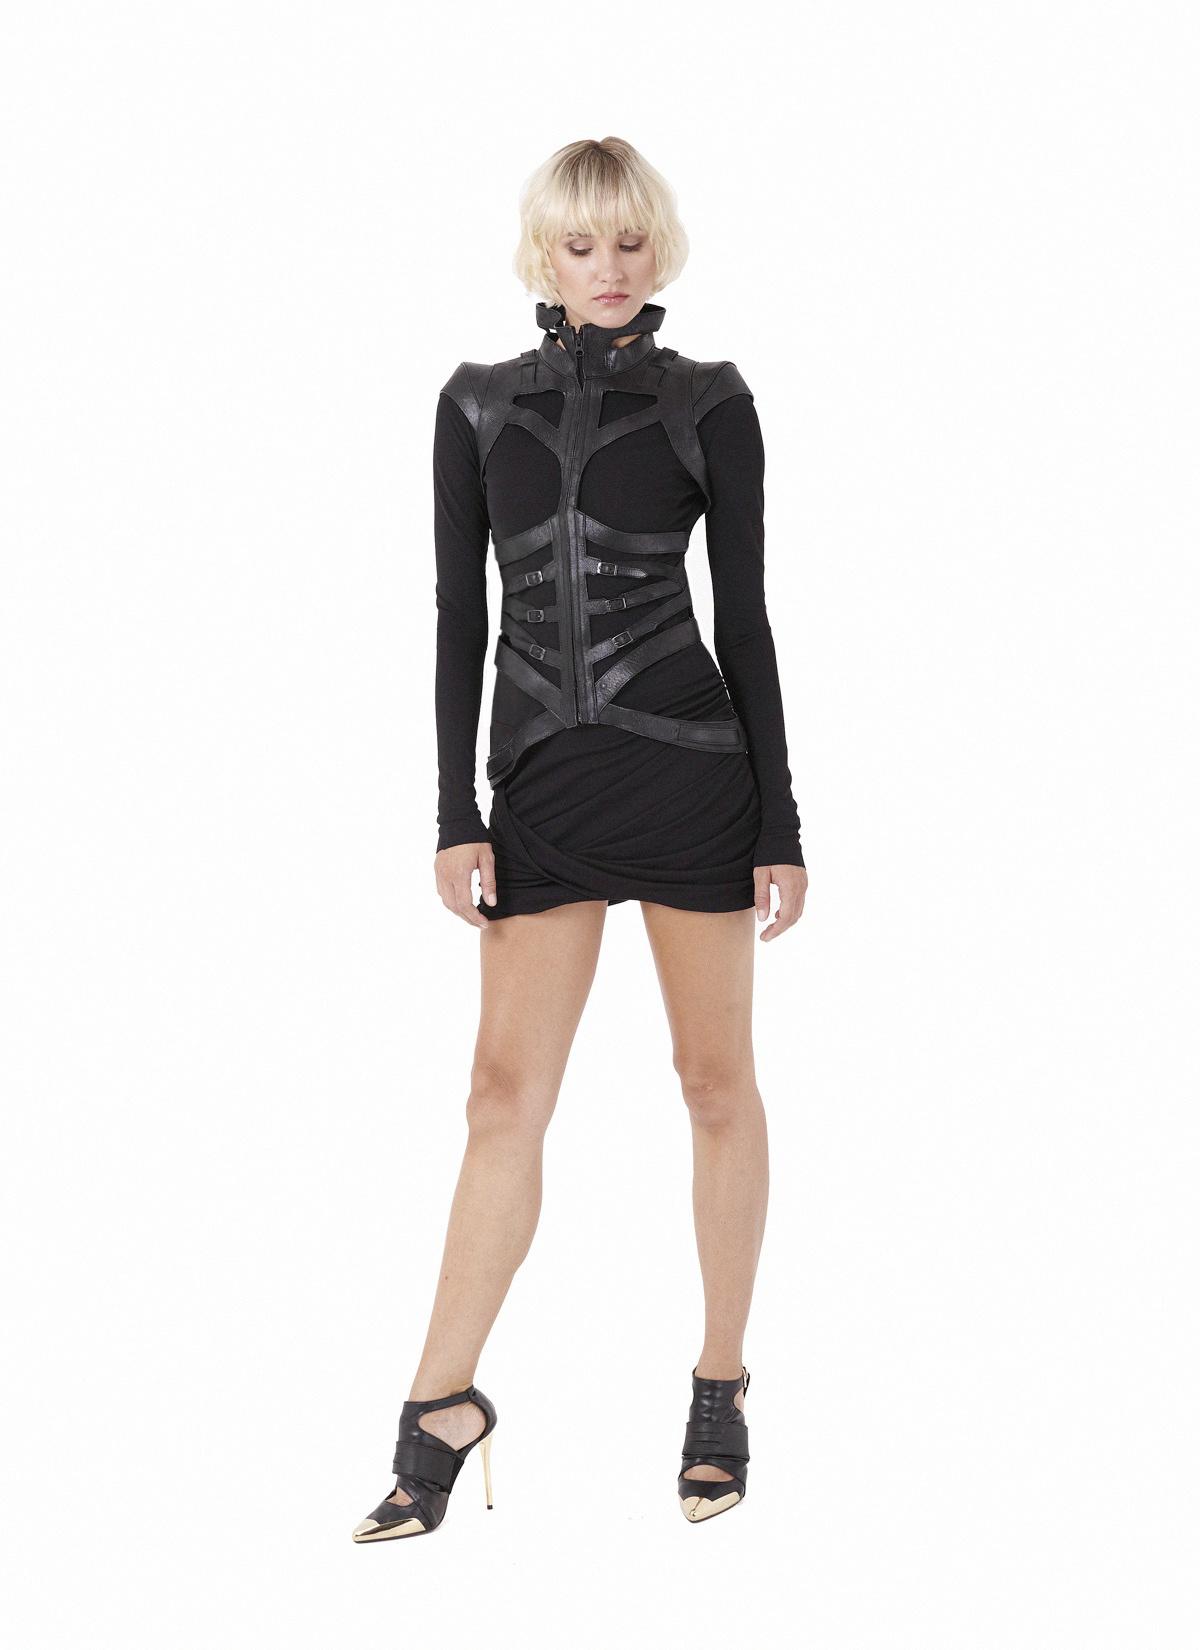 Quartz harness & Scoria dress